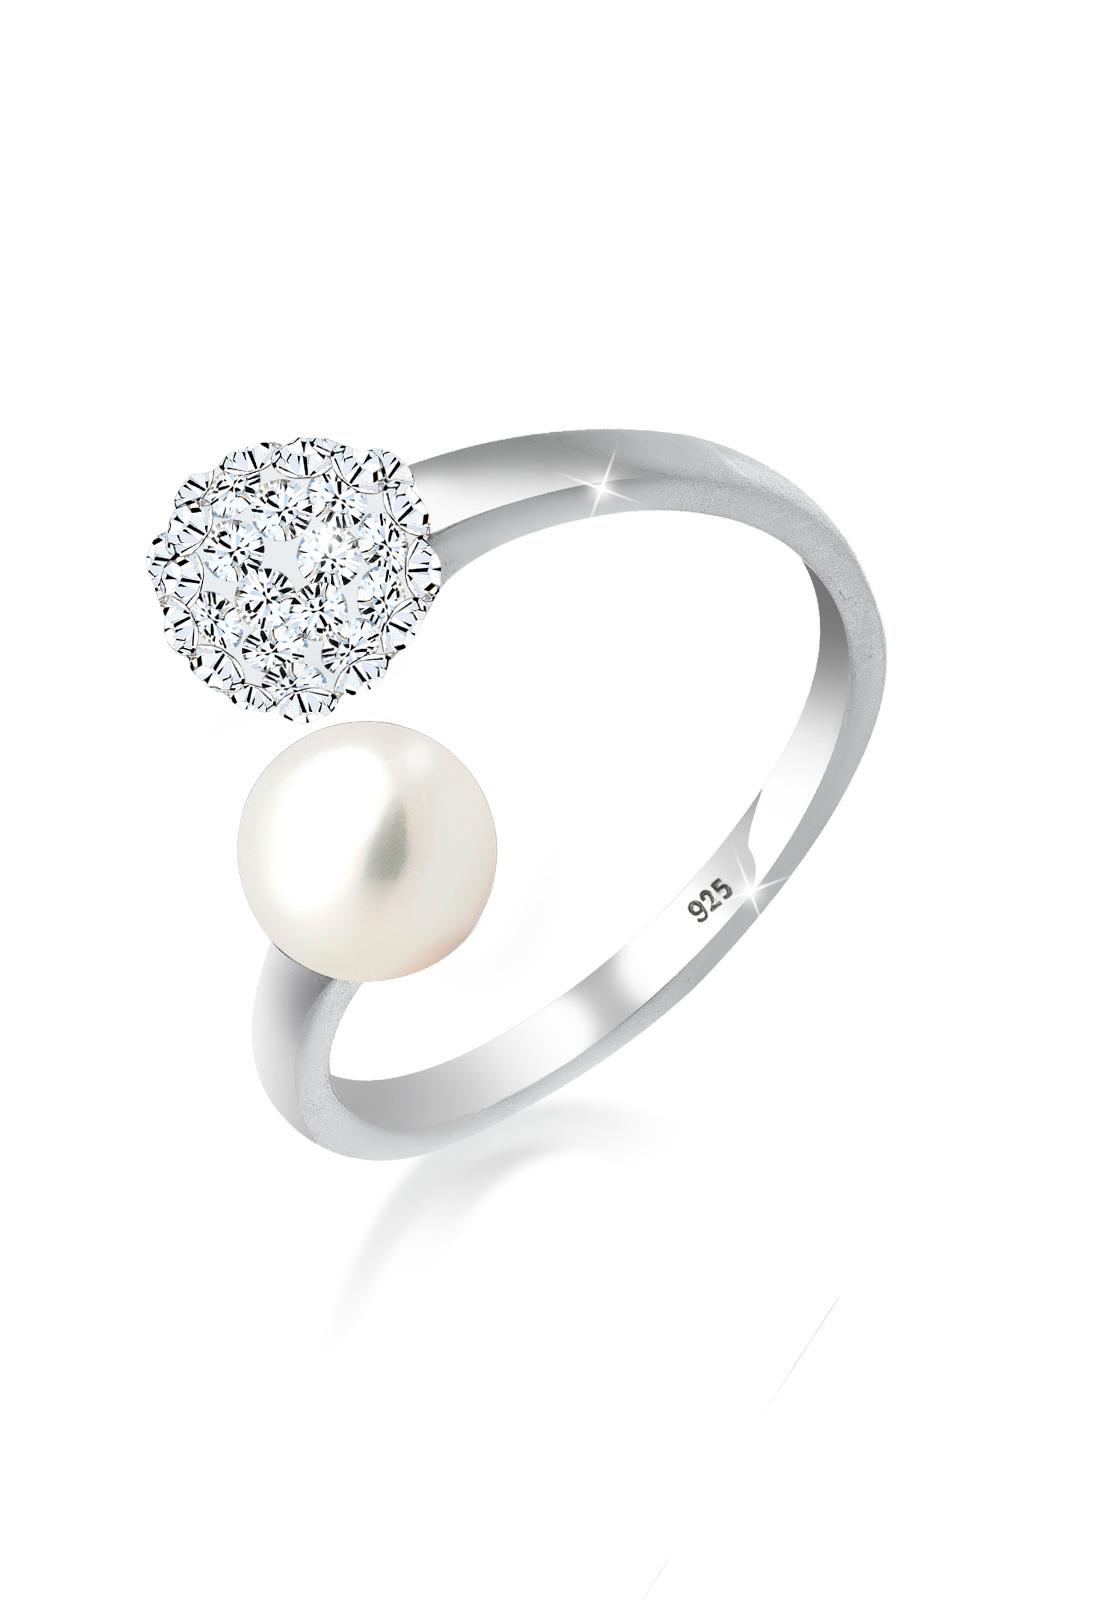 Ring Kugel   Kristall ( Weiß )   925er Sterling Silber